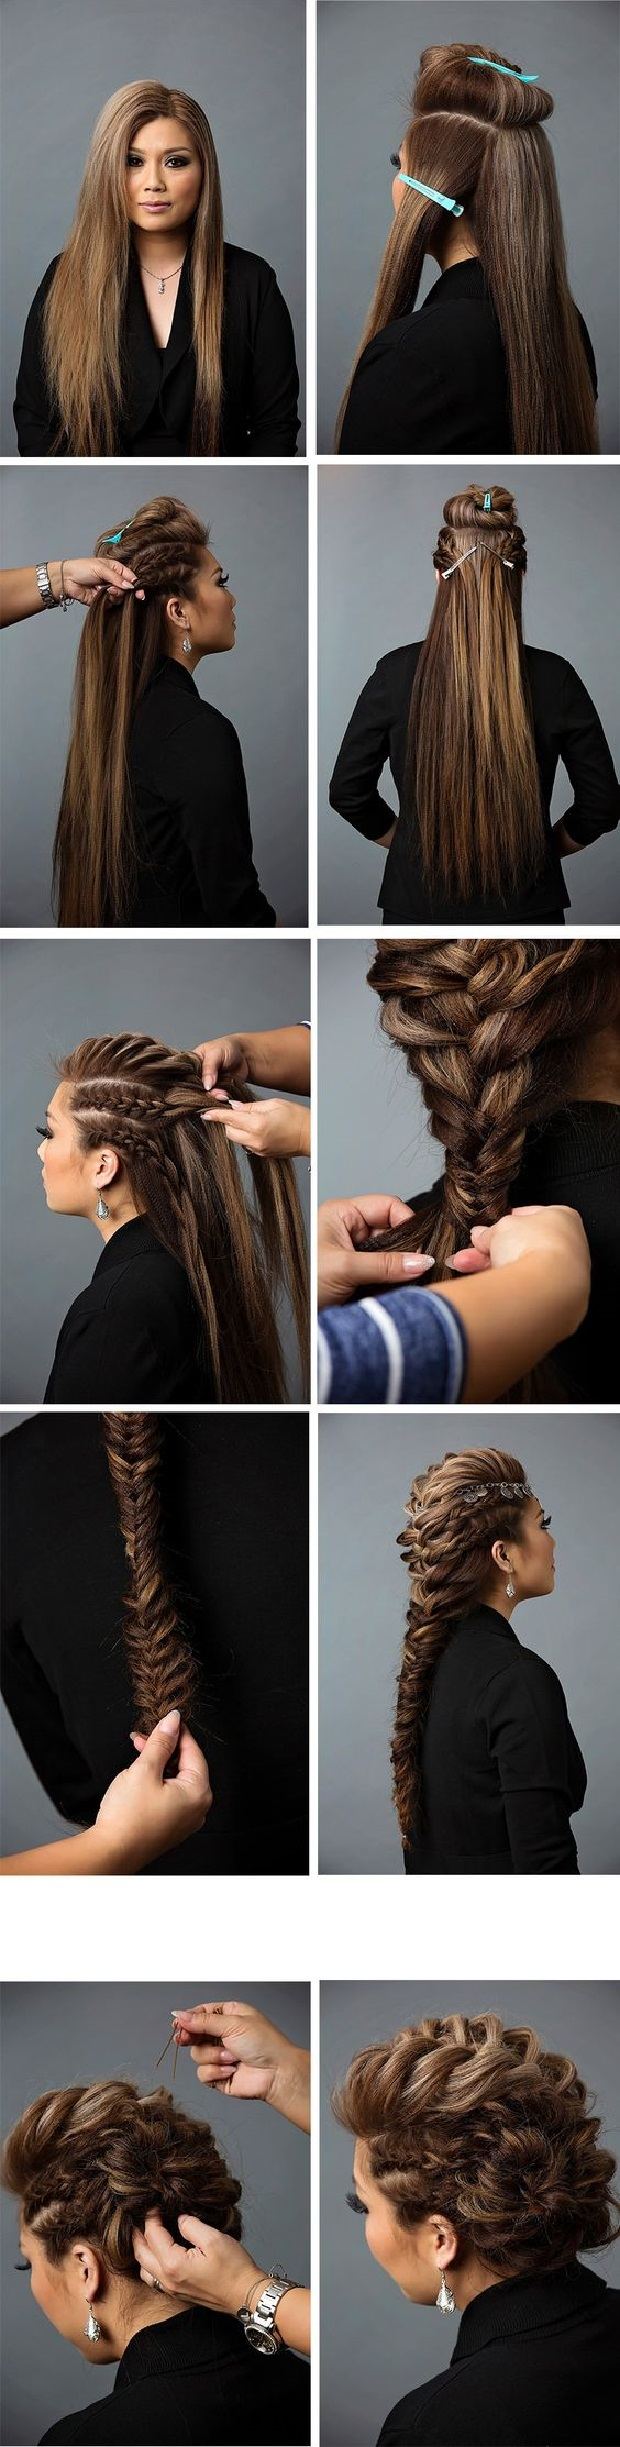 peinado-elegante-con-trenzas